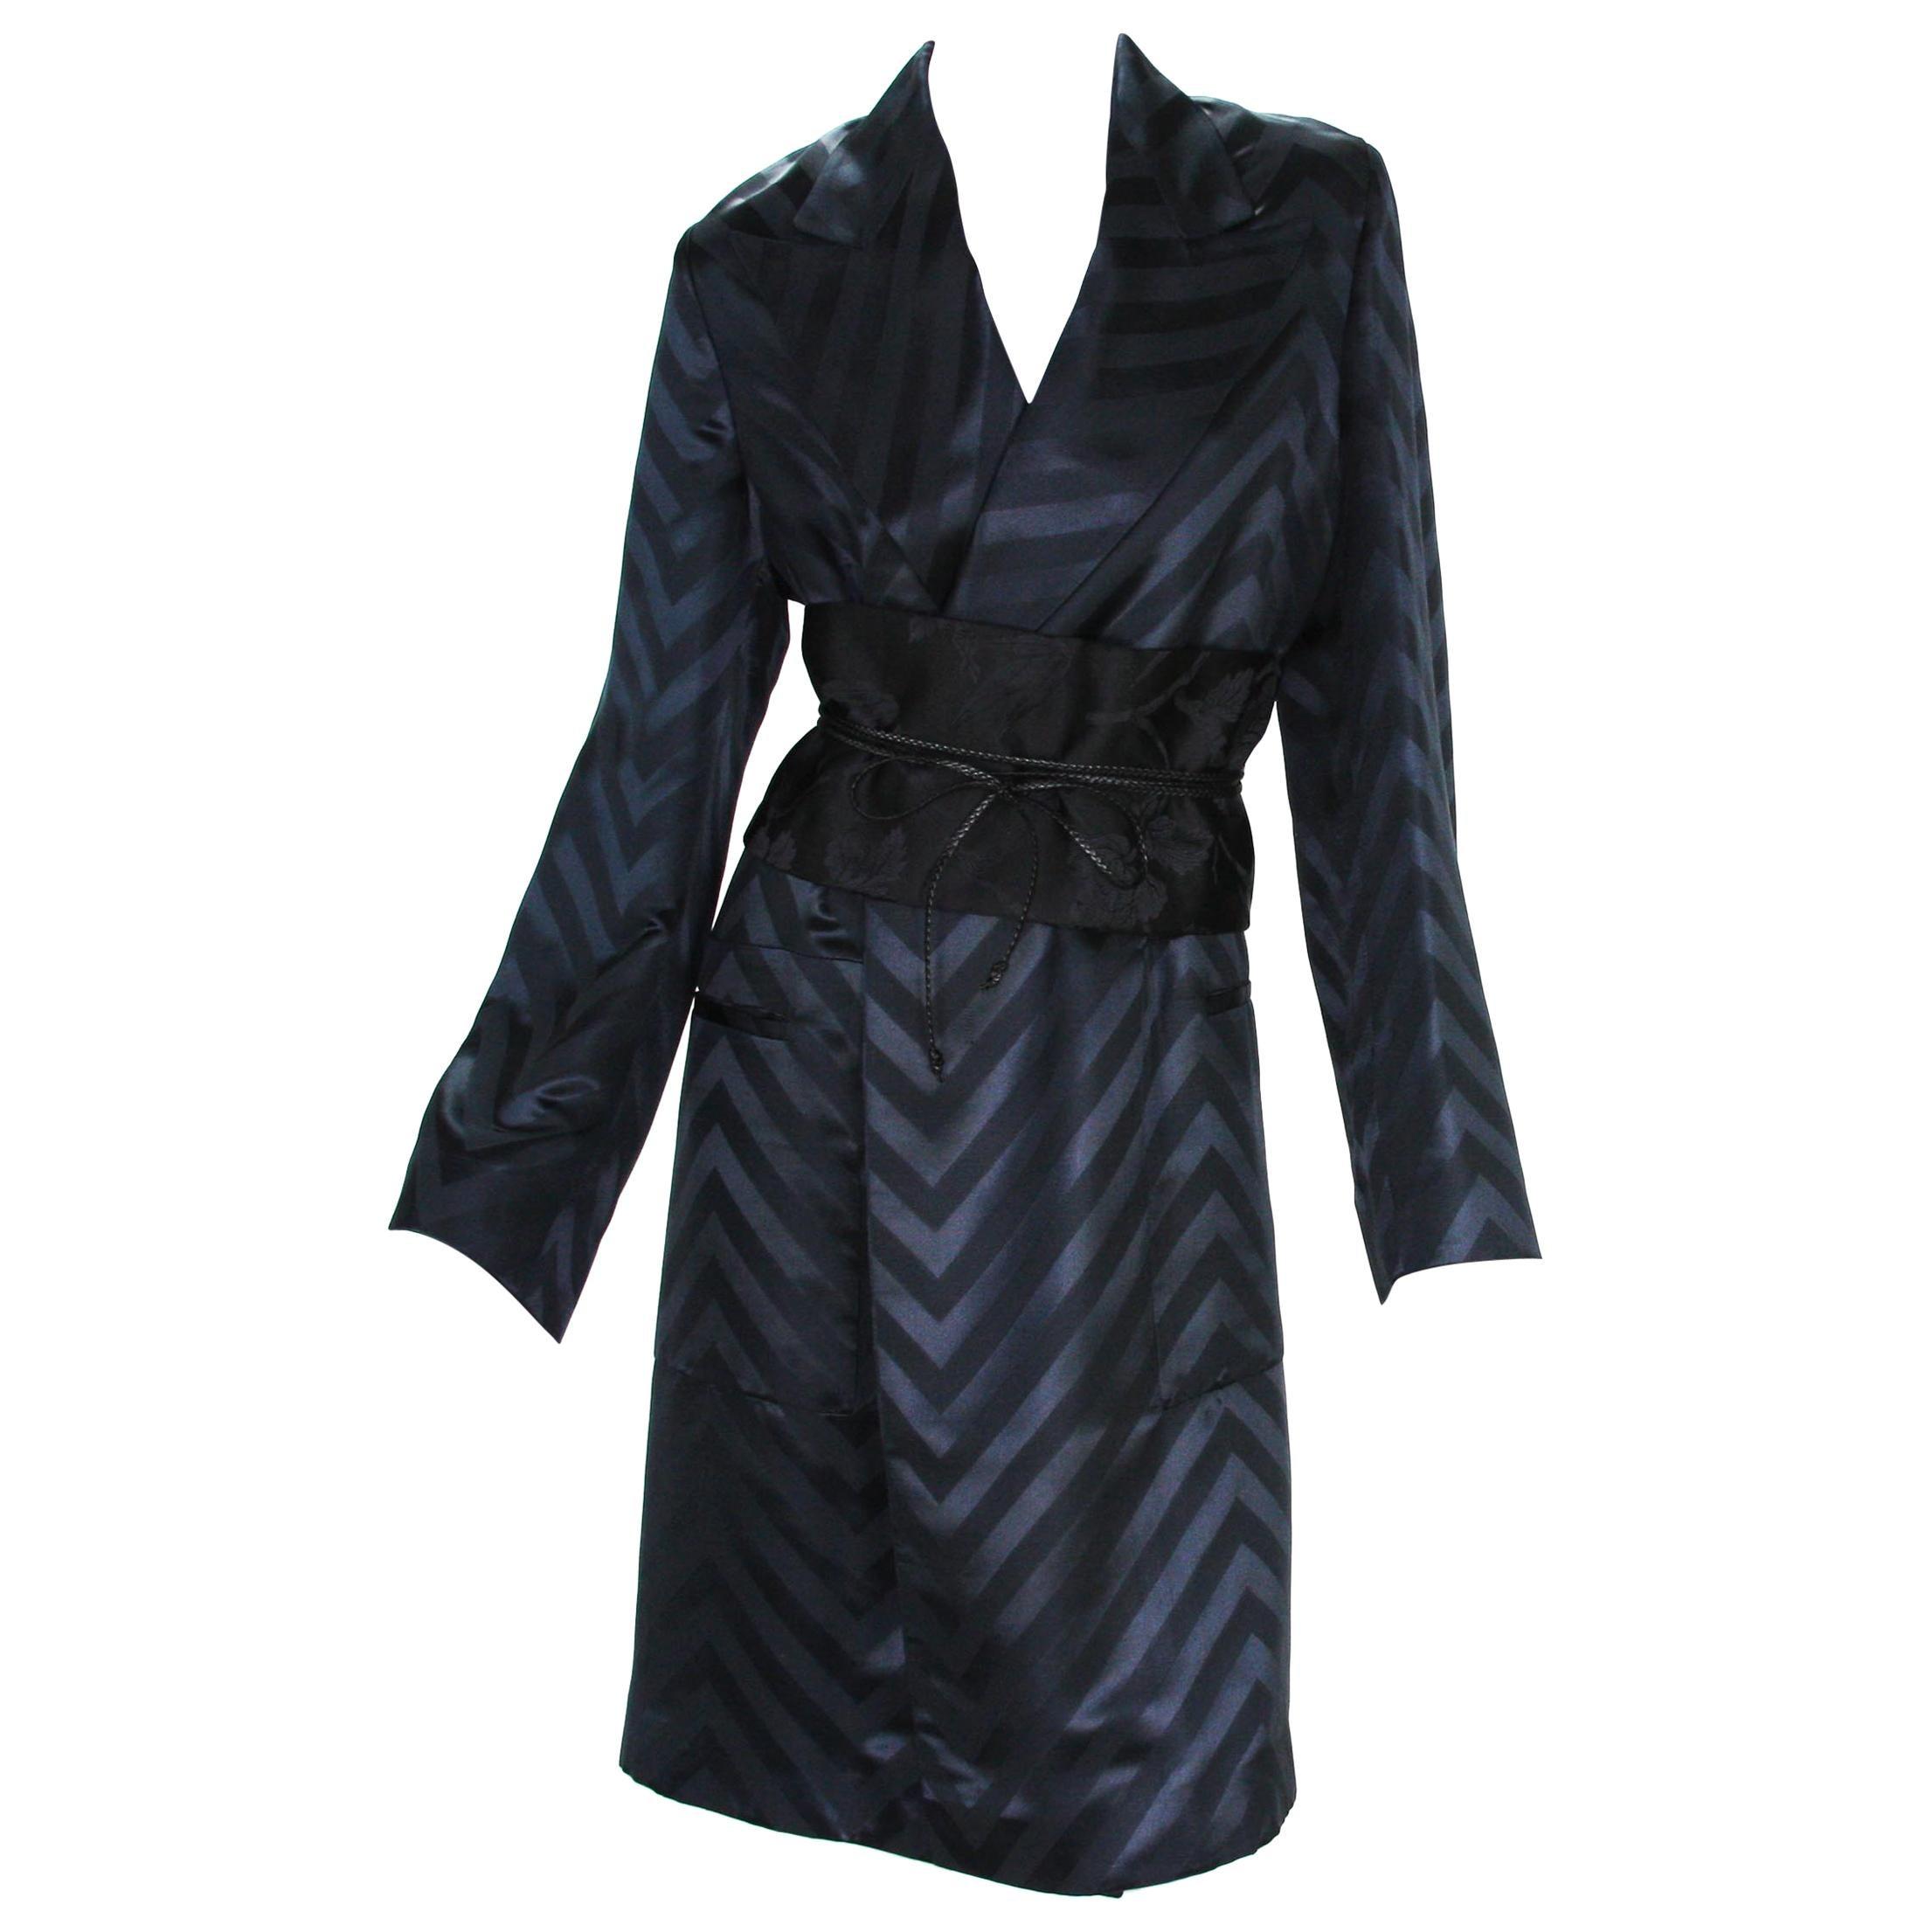 Tom Ford for Gucci F/W 2002 Black Silk Chevron Kimono Coat with Obi Belt It. 40